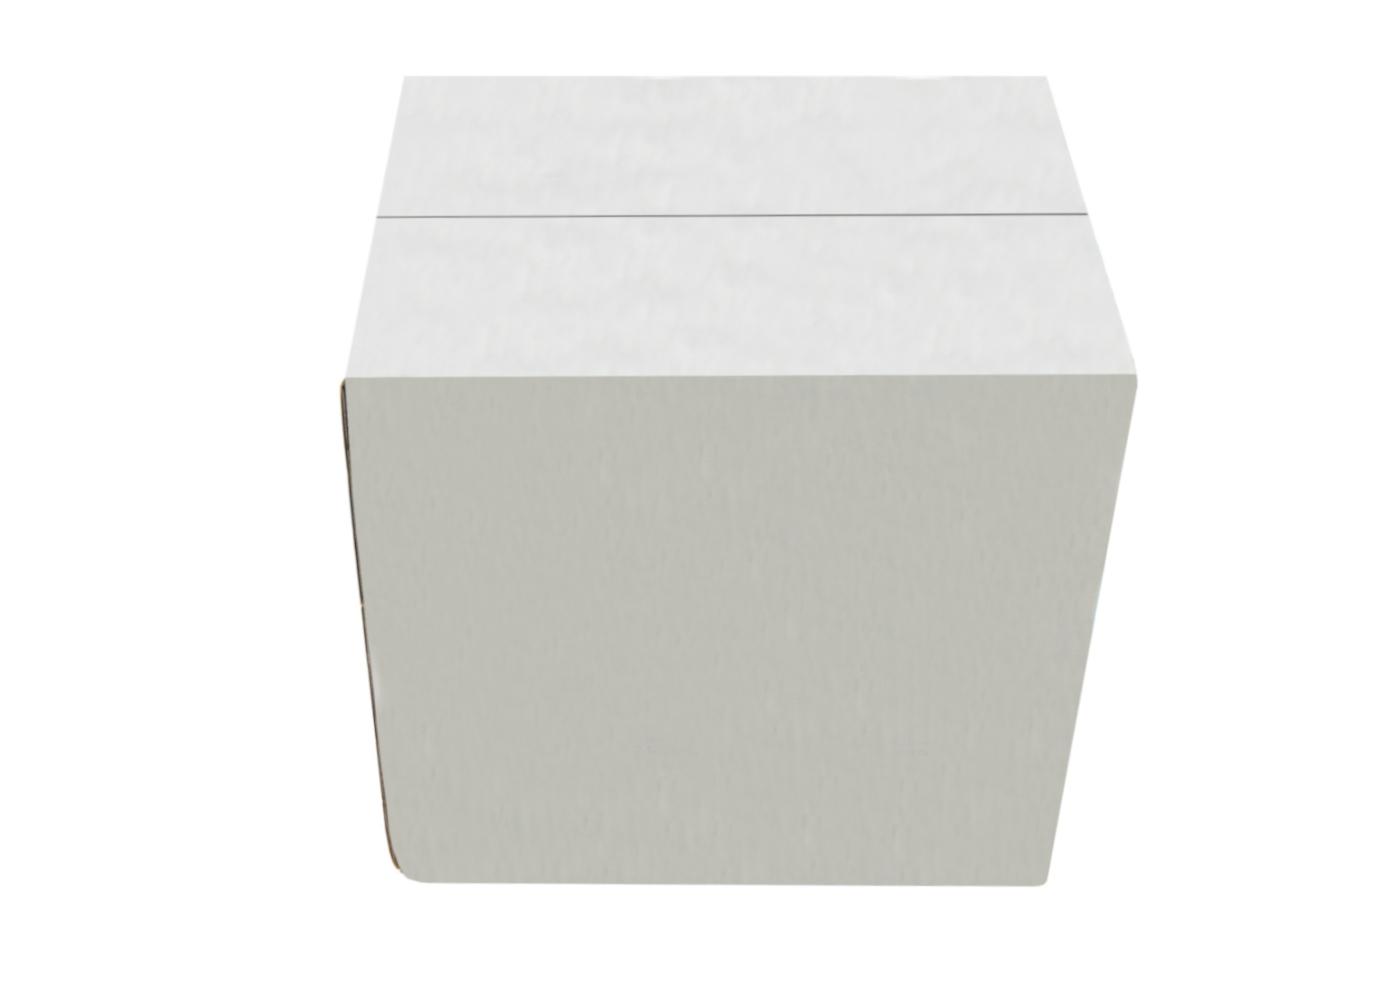 Упаковка для мегаомметра М6-1